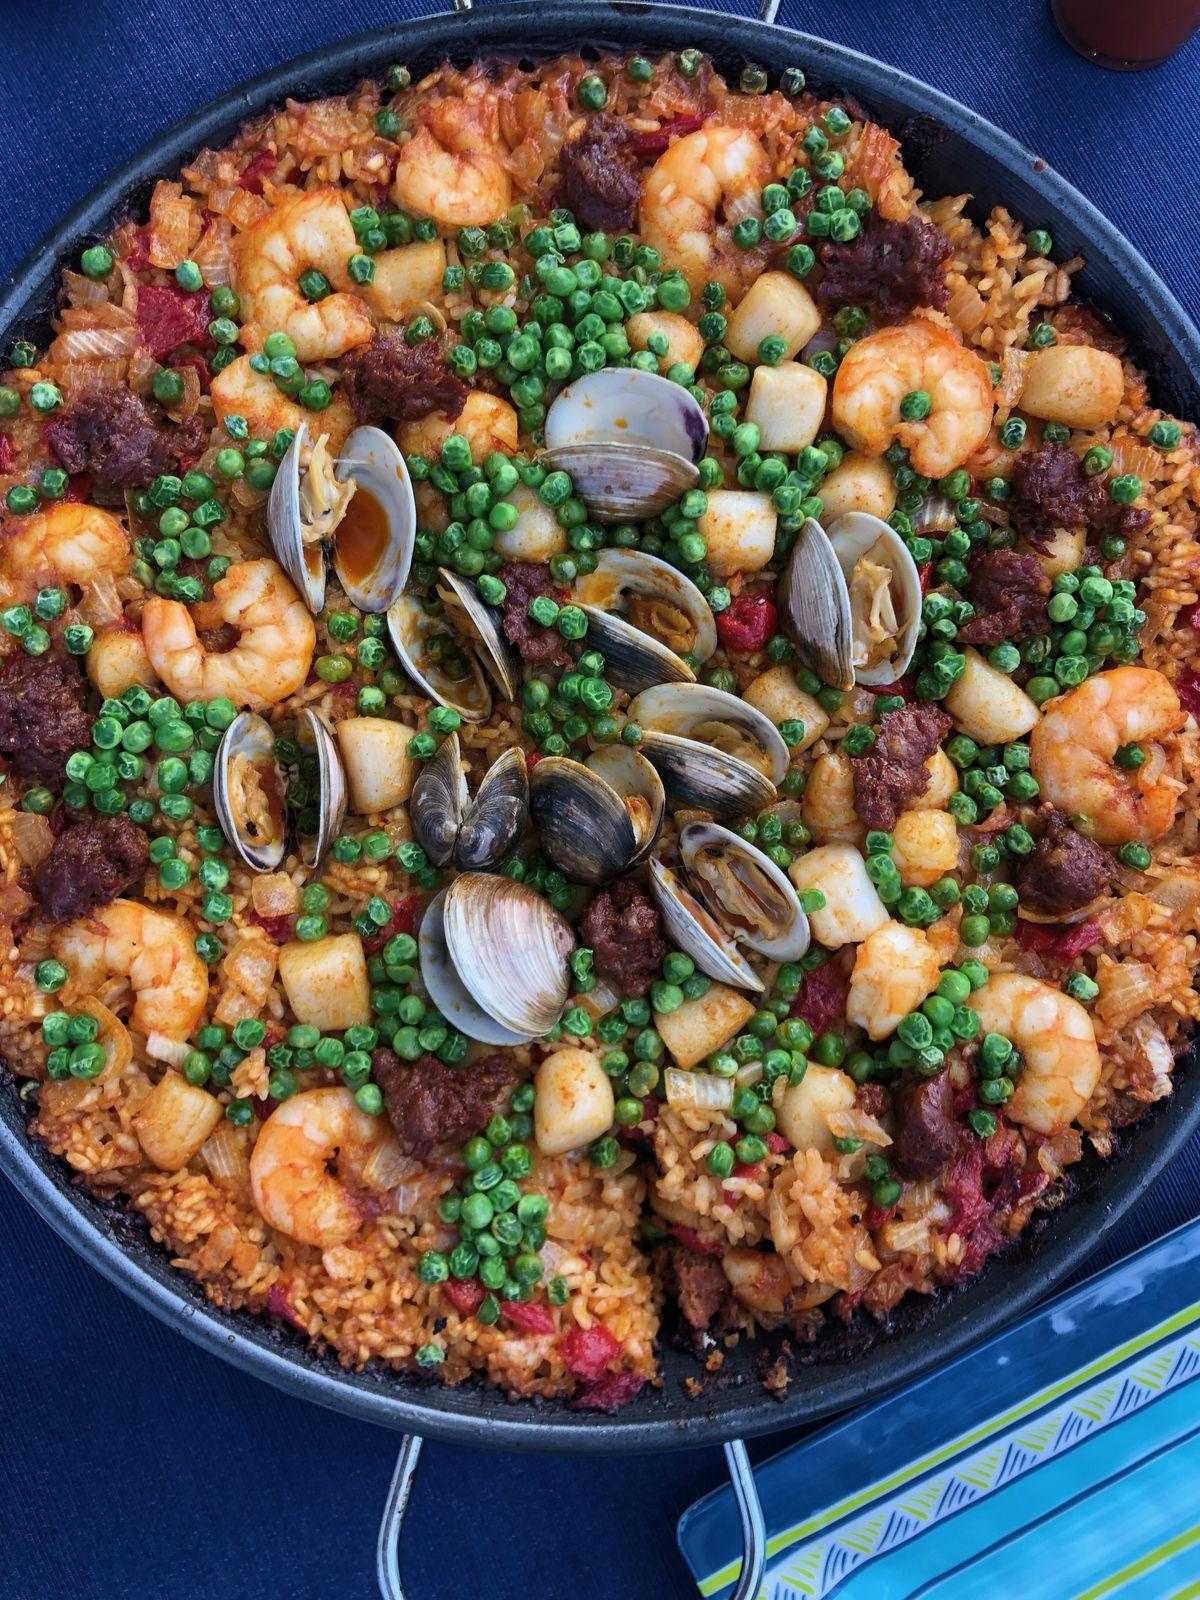 A pan of paella with peas and shellfish